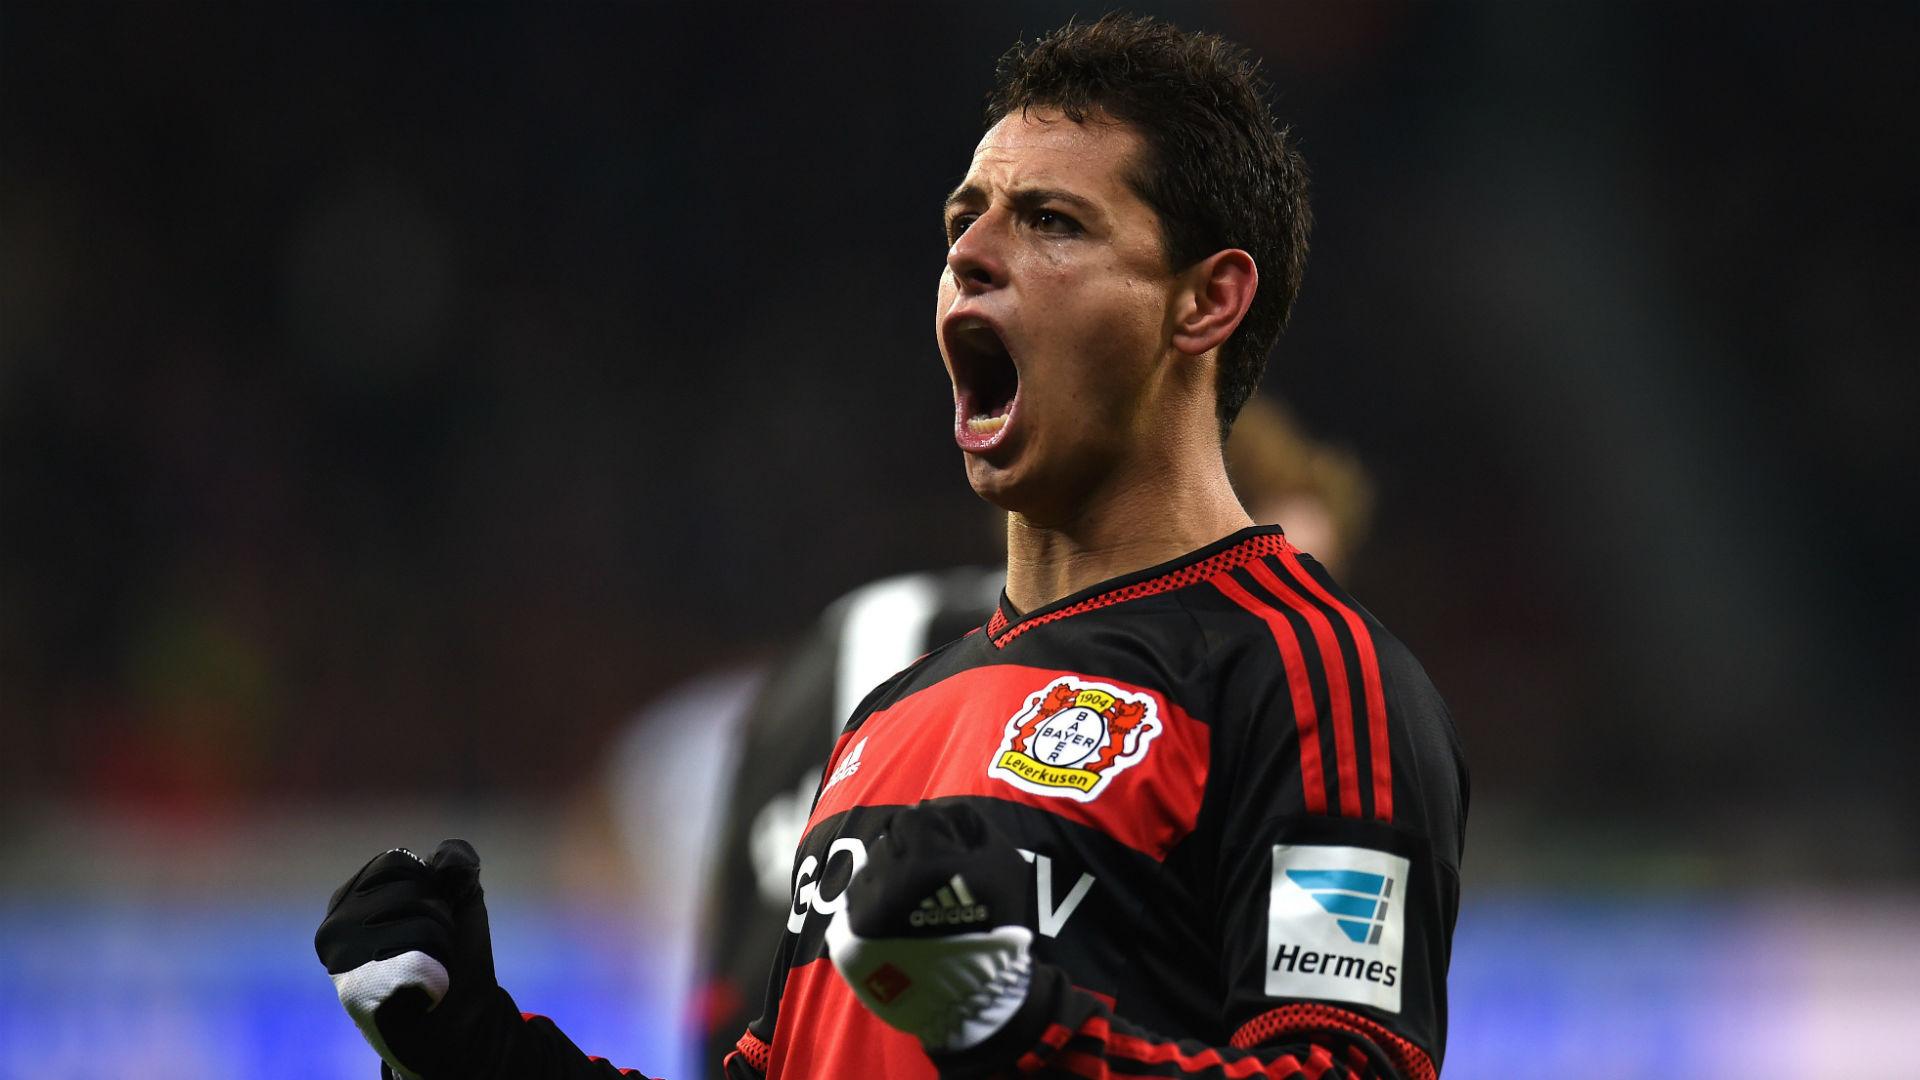 Video: Bayer Leverkusen vs Borussia M gladbach